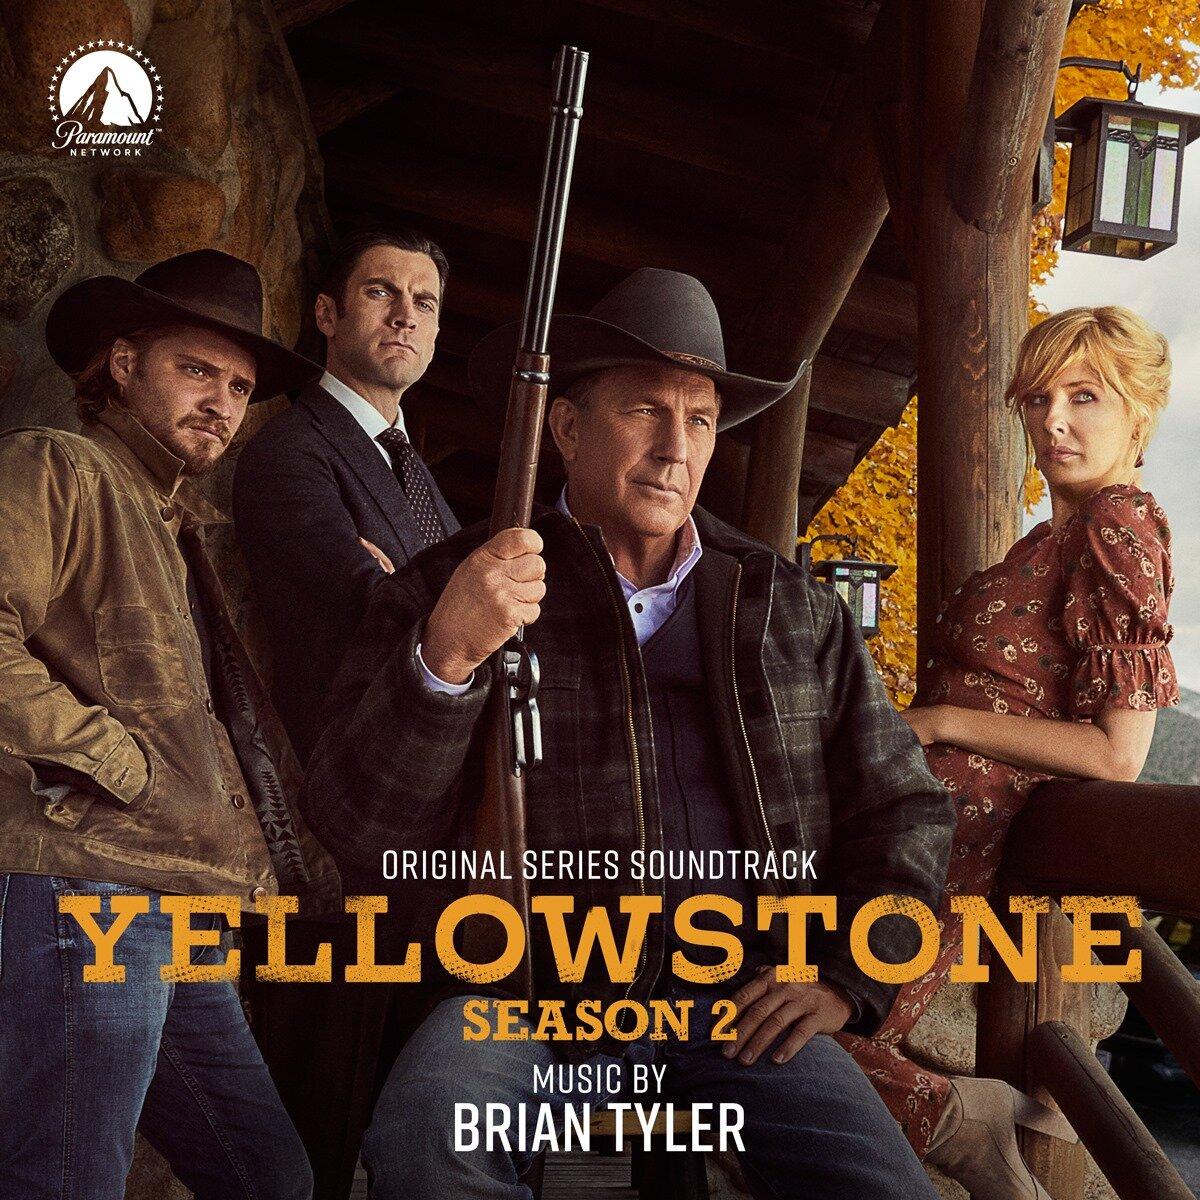 *yellowstone season 2